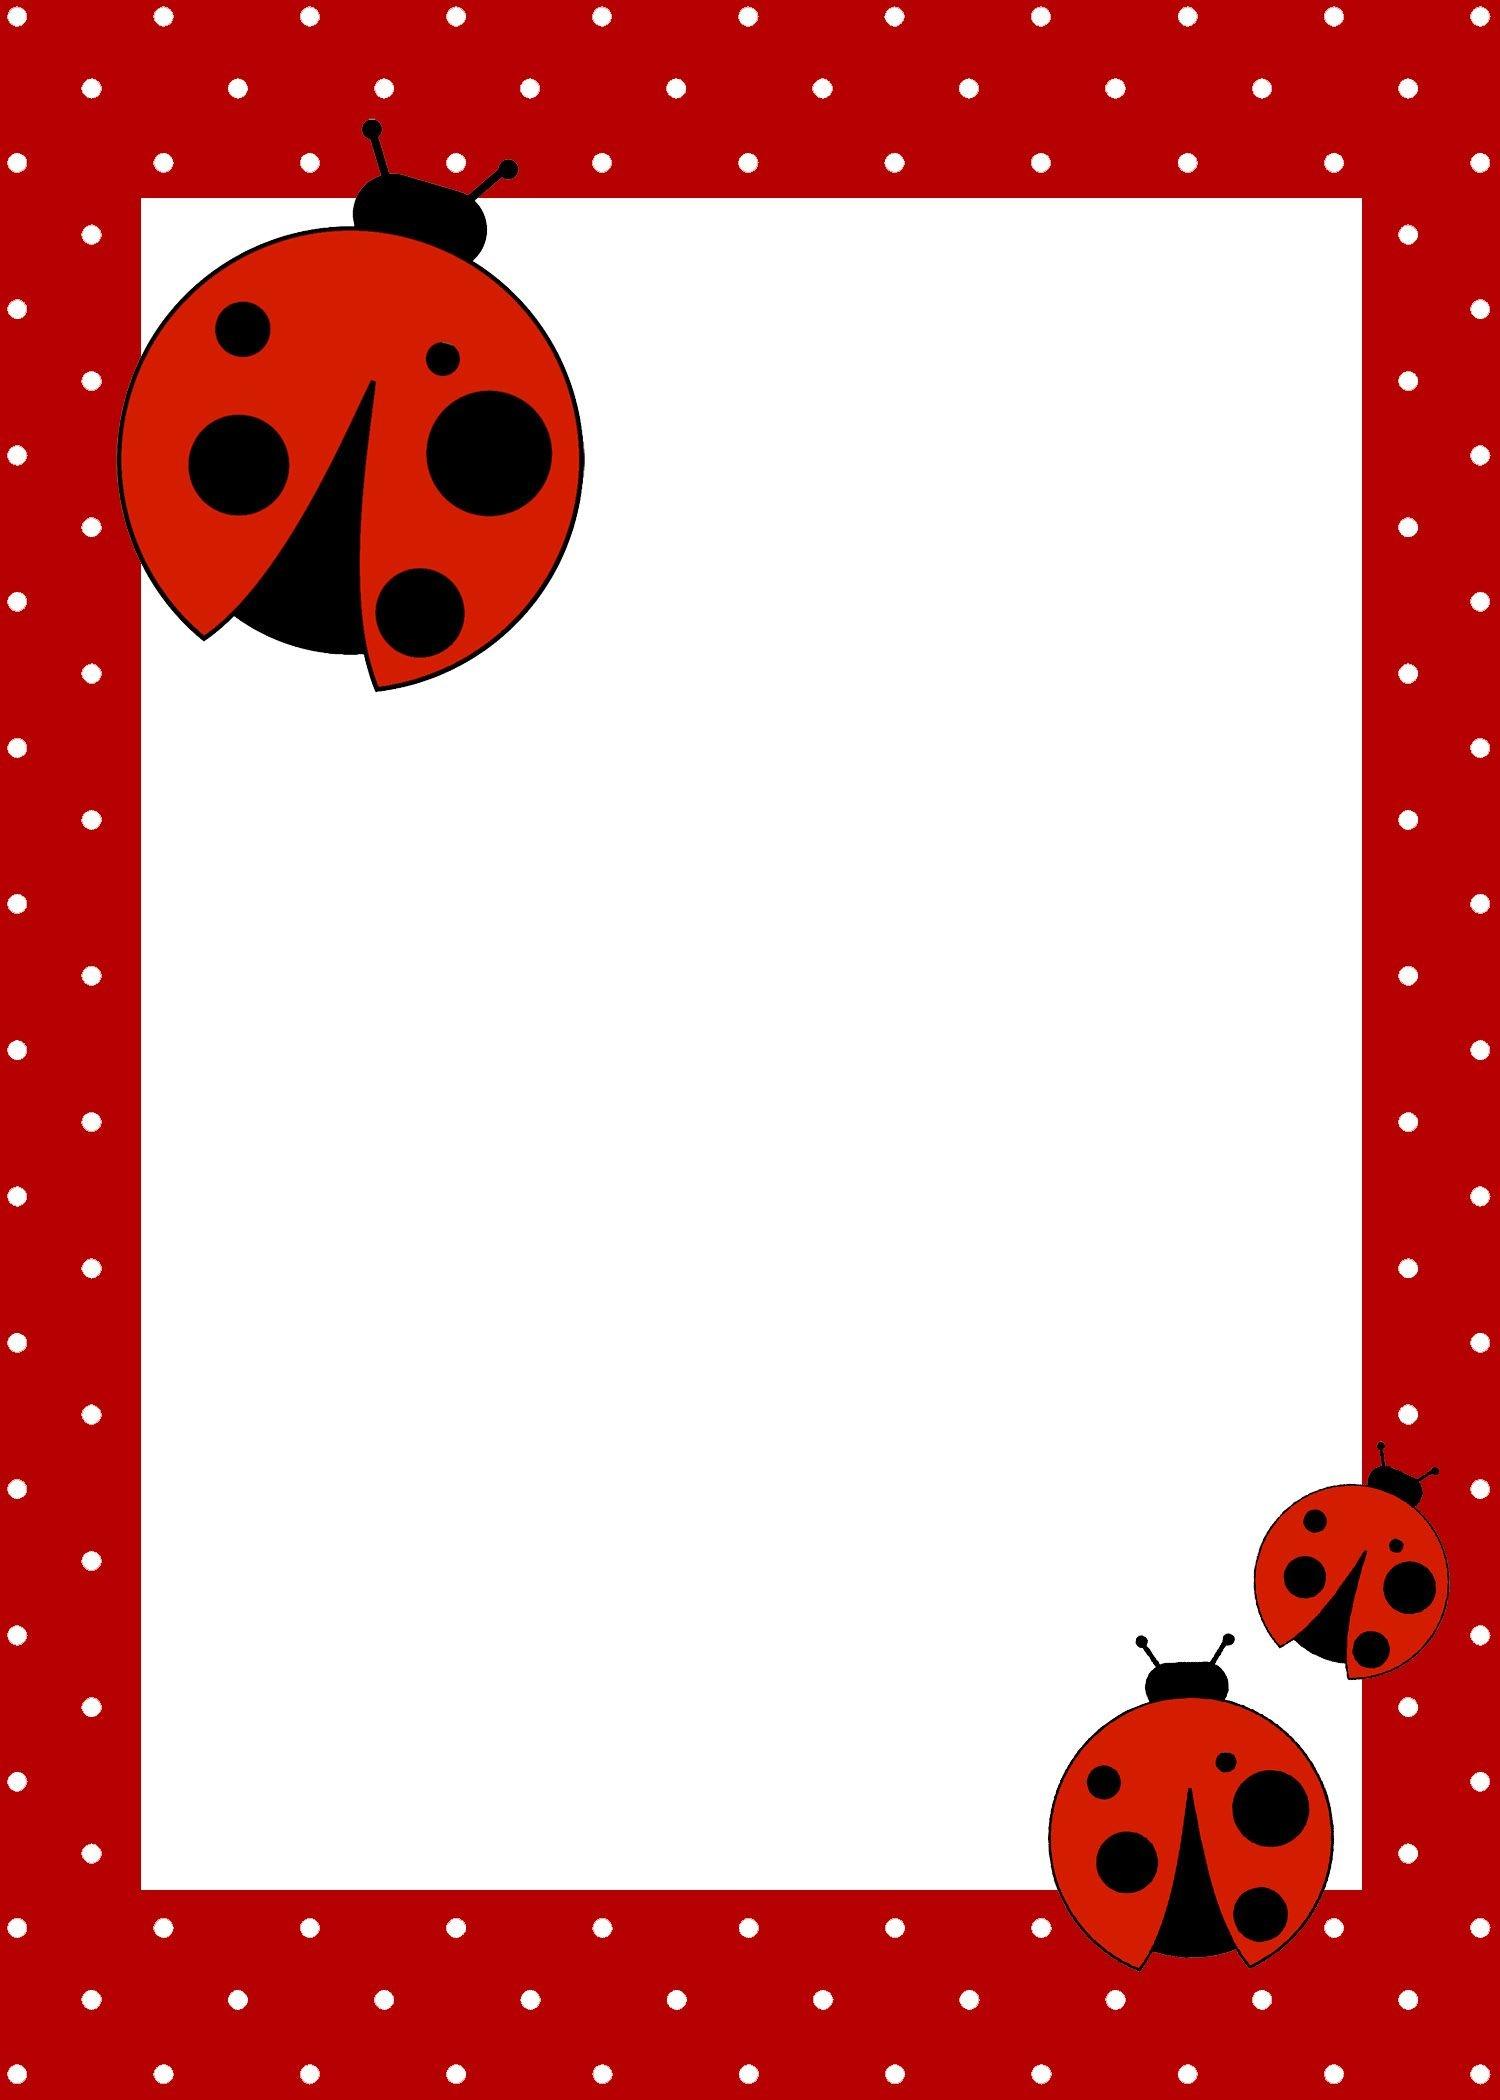 Ladybug Birthday Party With Free Printables | Ideas For The Craft - Free Printable Ladybug Invitations